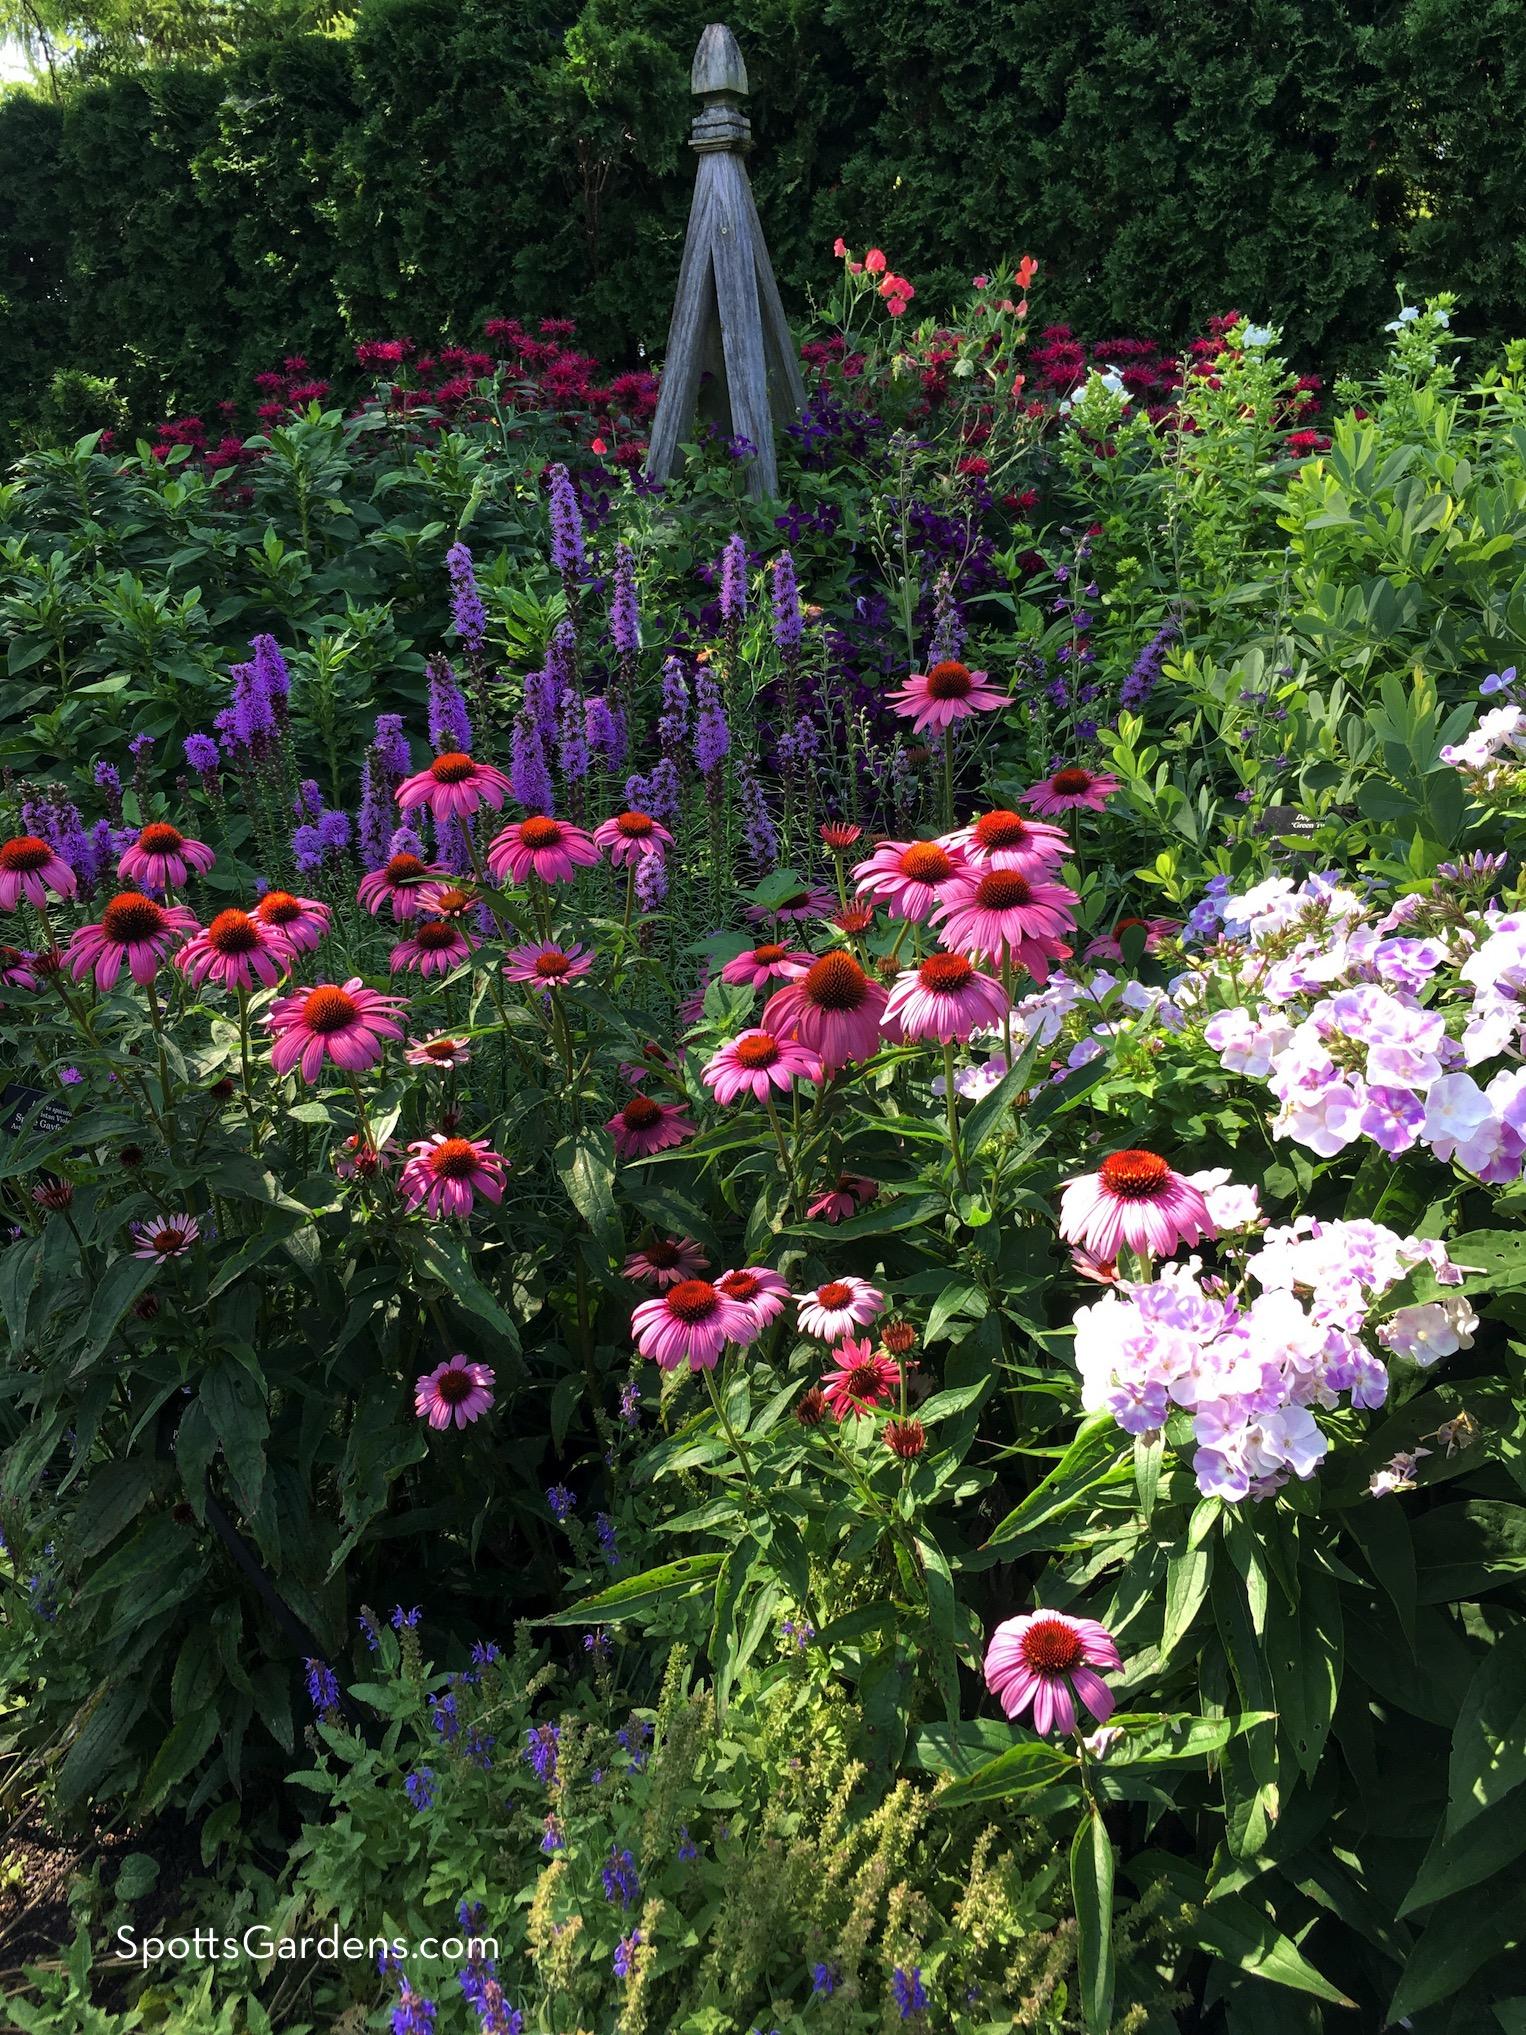 Wooden garden tuteur with blooming flowers